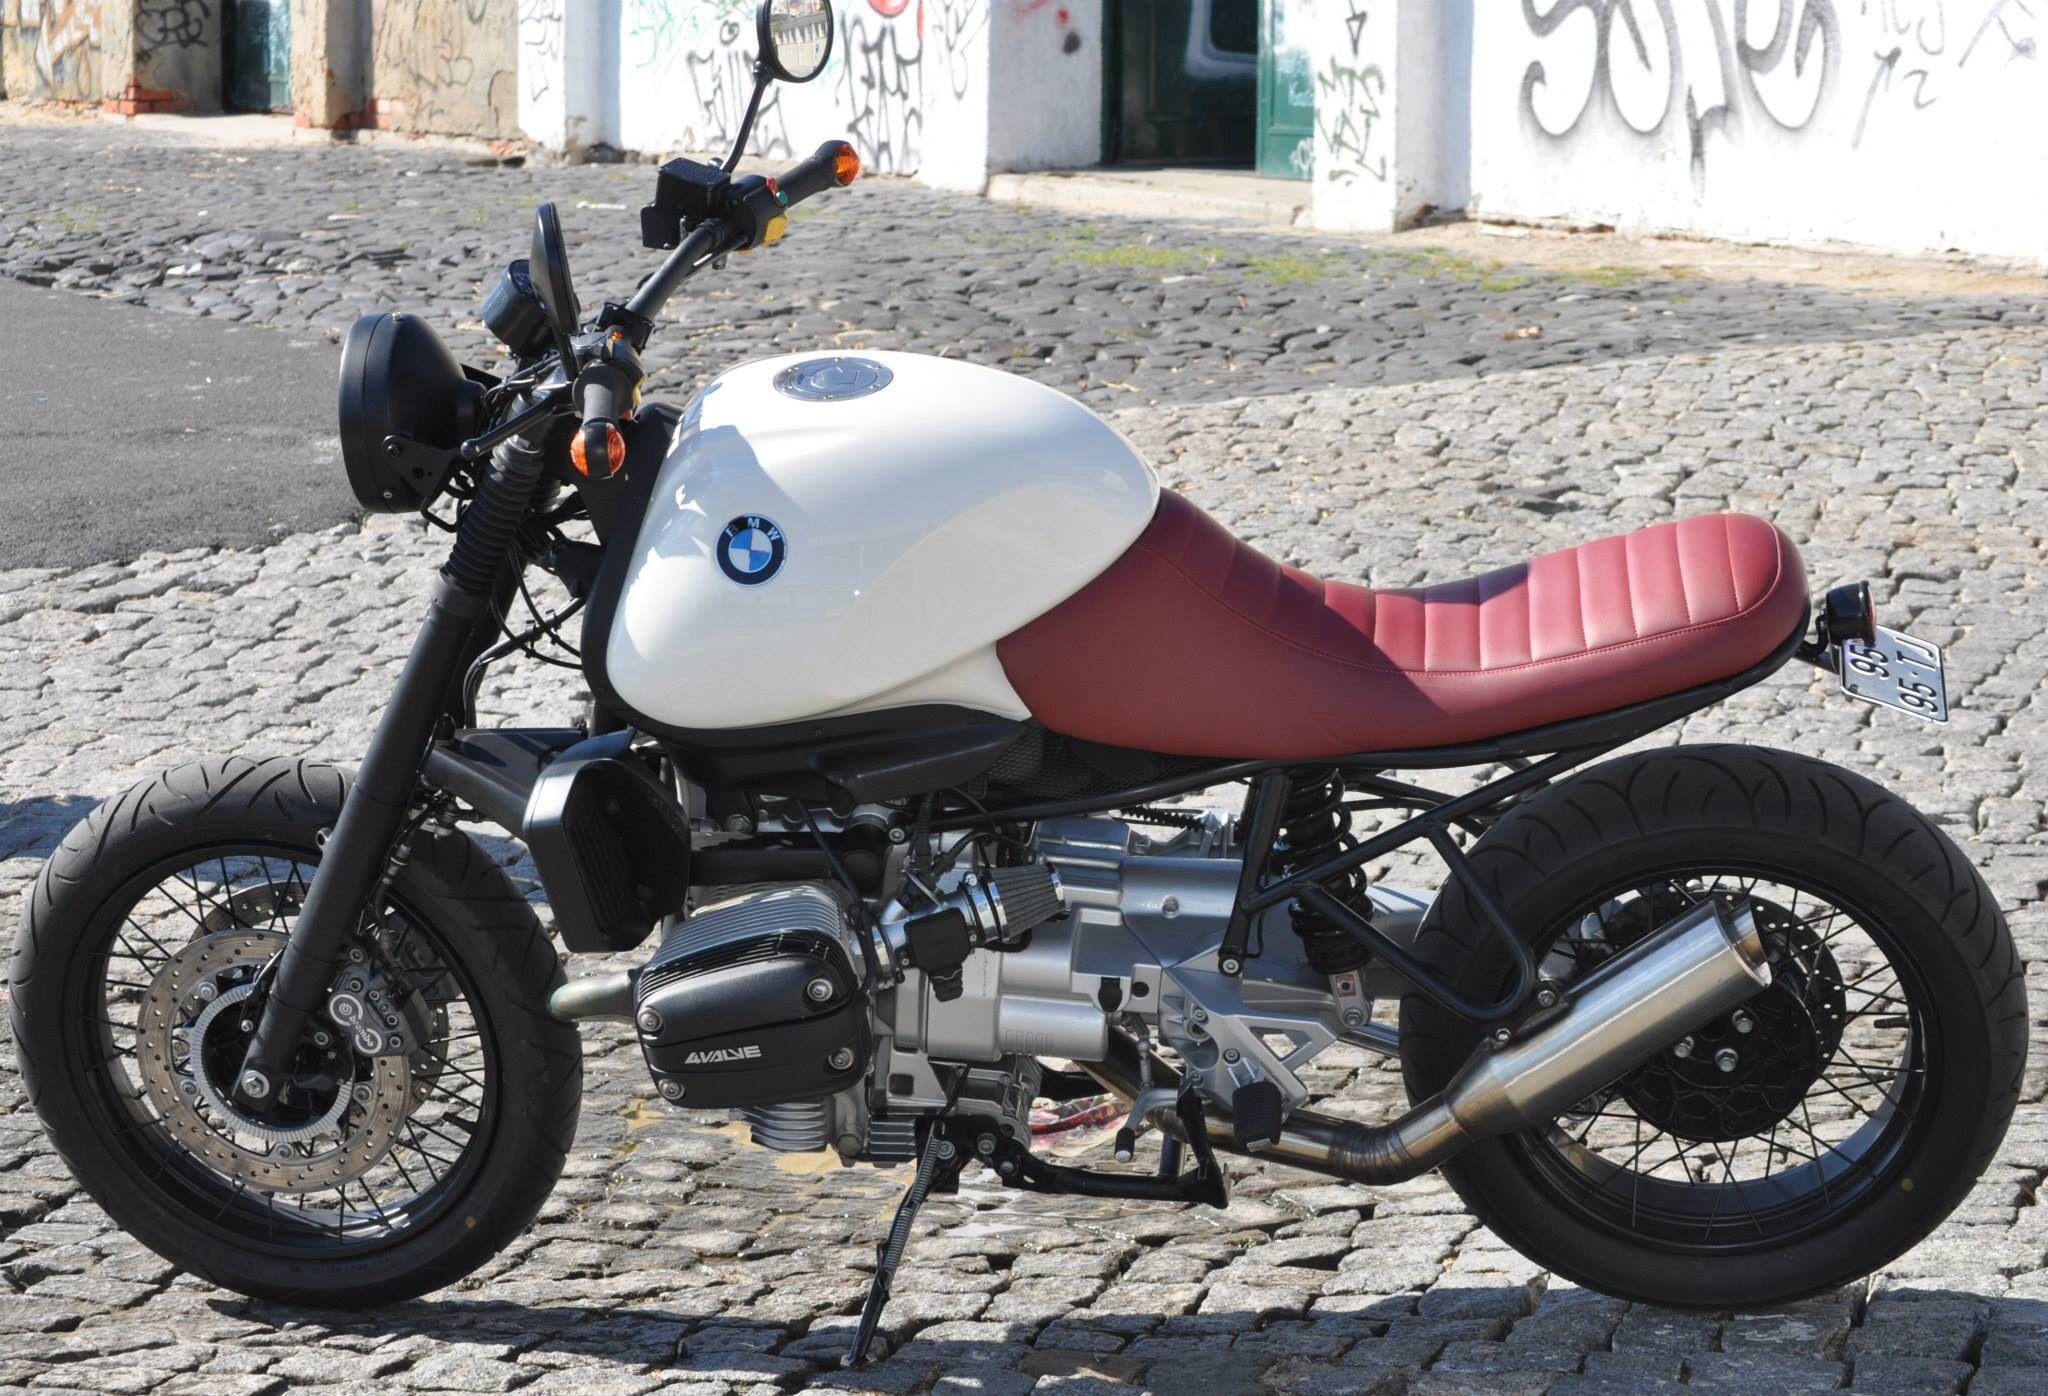 cafe racer bmw motoren pinterest motos motocicletas. Black Bedroom Furniture Sets. Home Design Ideas